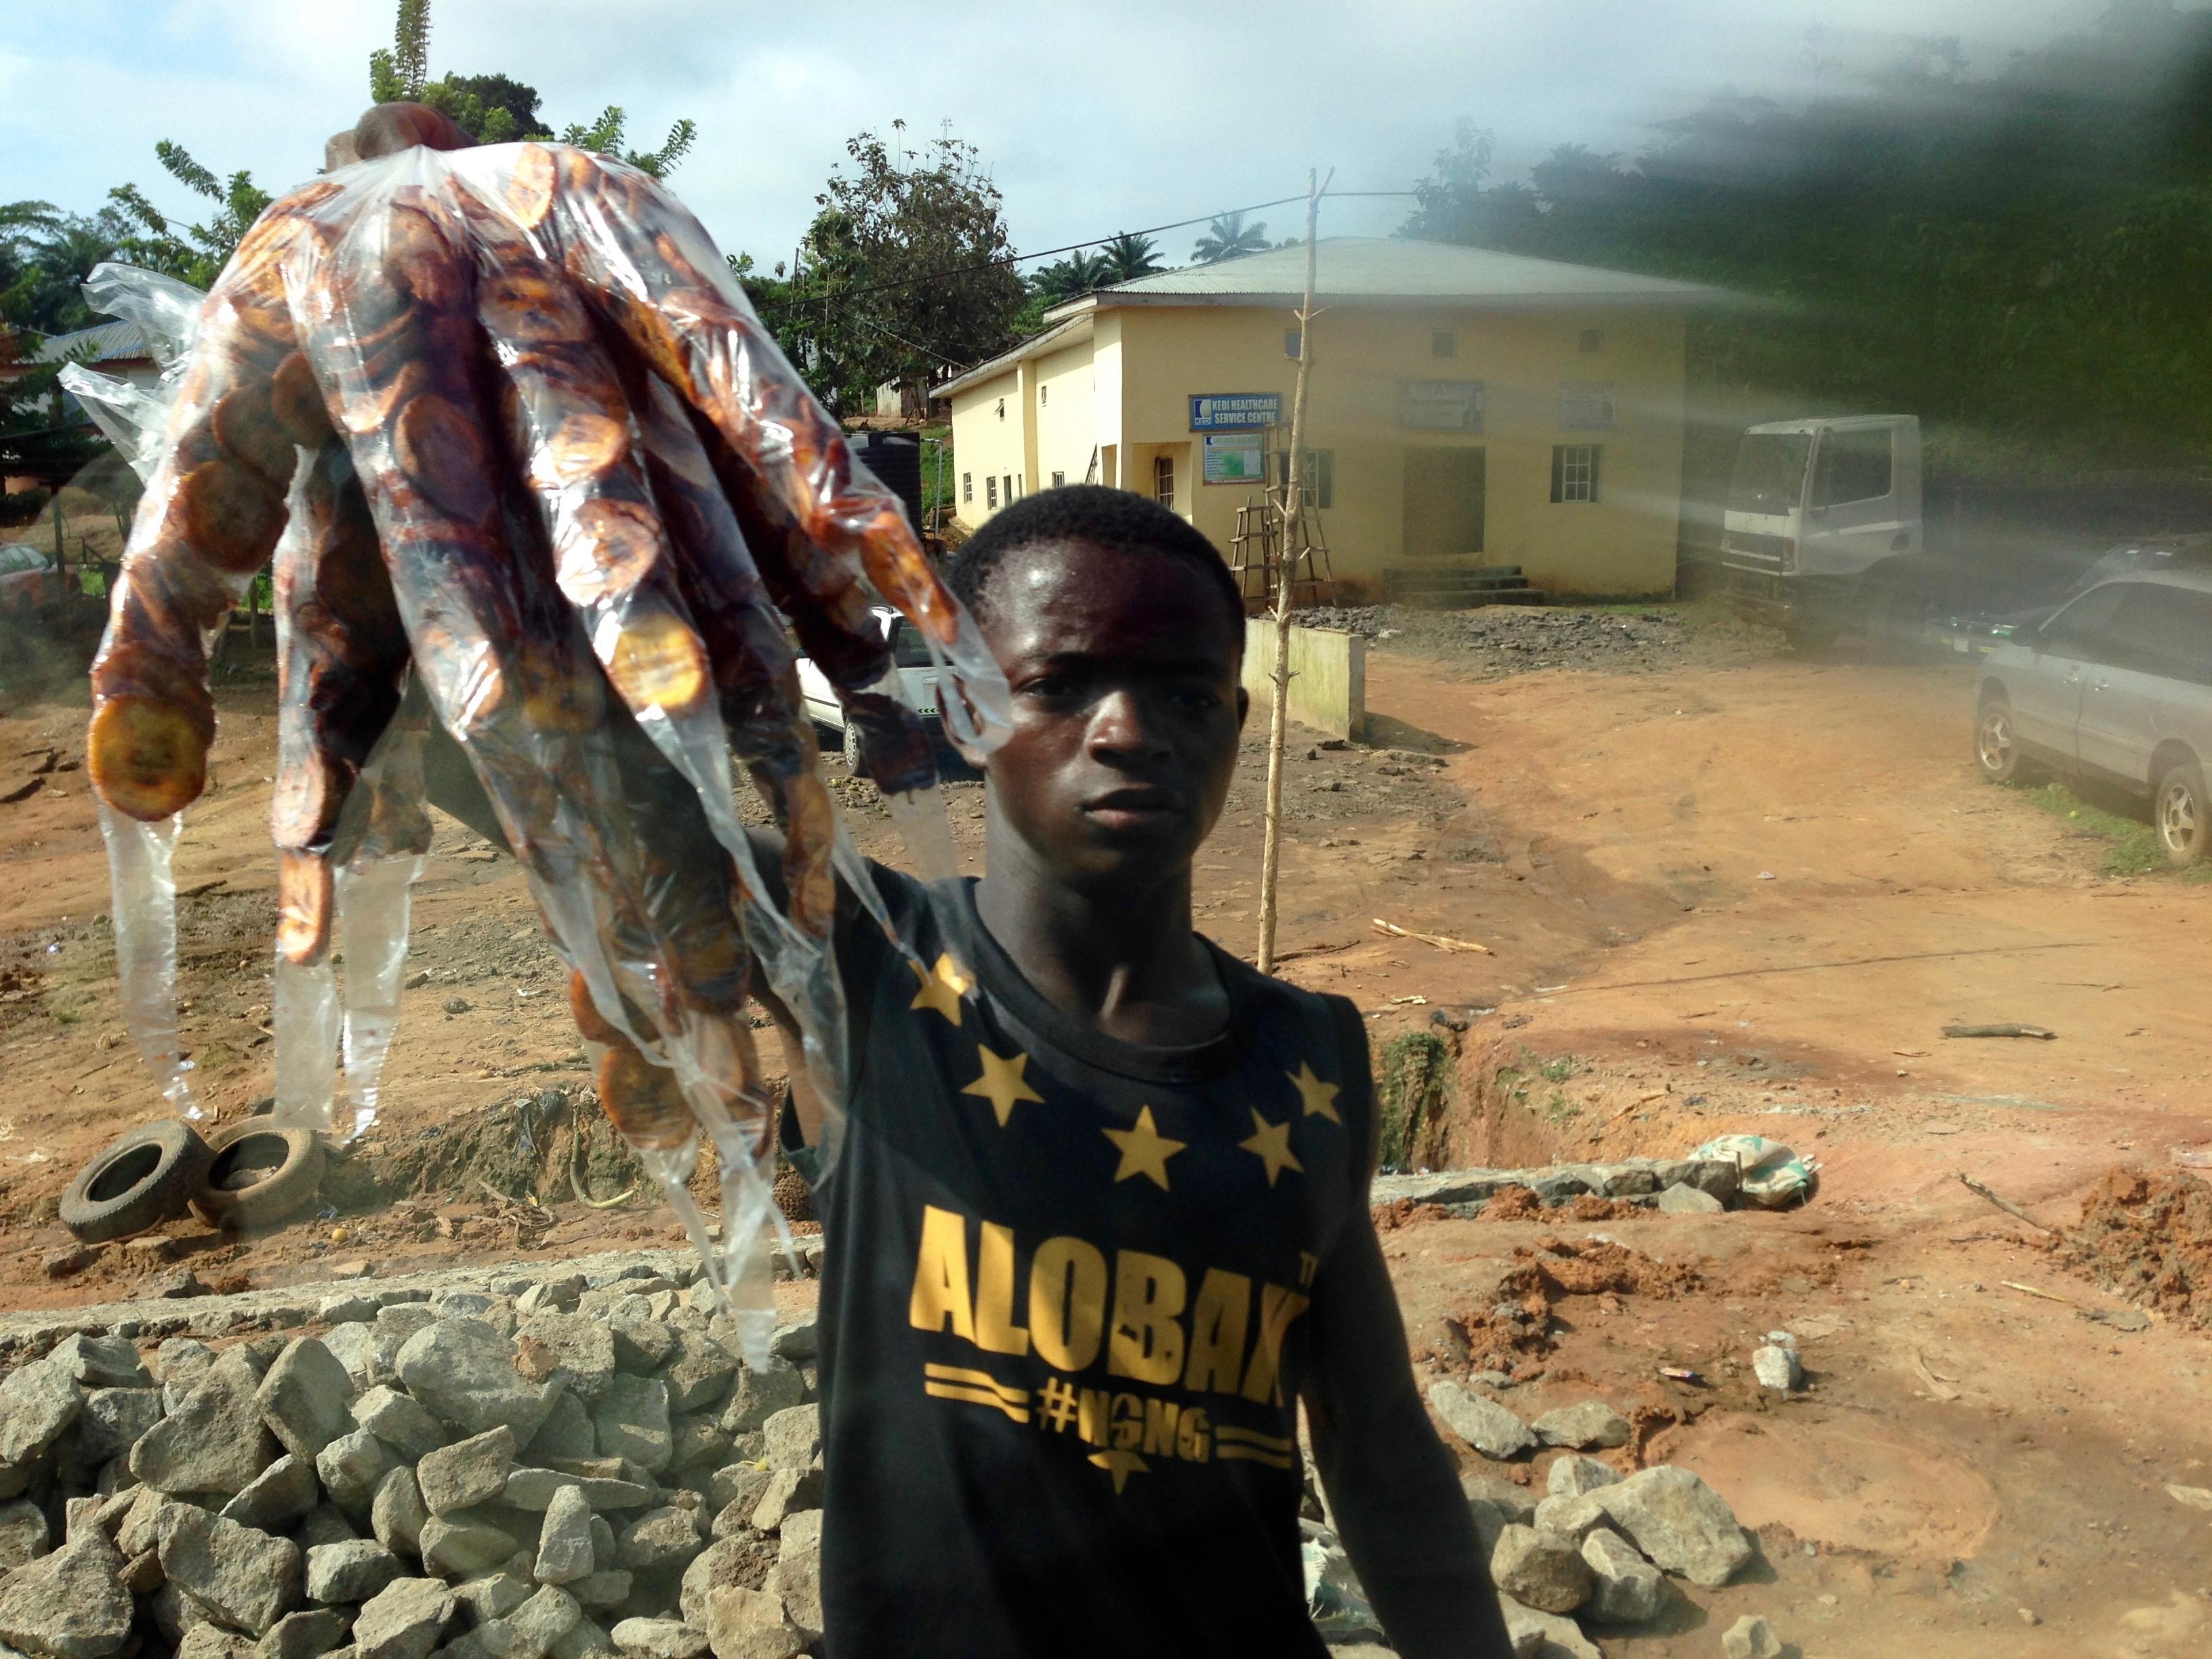 Roadside hawking fried plantains in Igbara Oke, Ondo, Nigeria. #JujuFilms